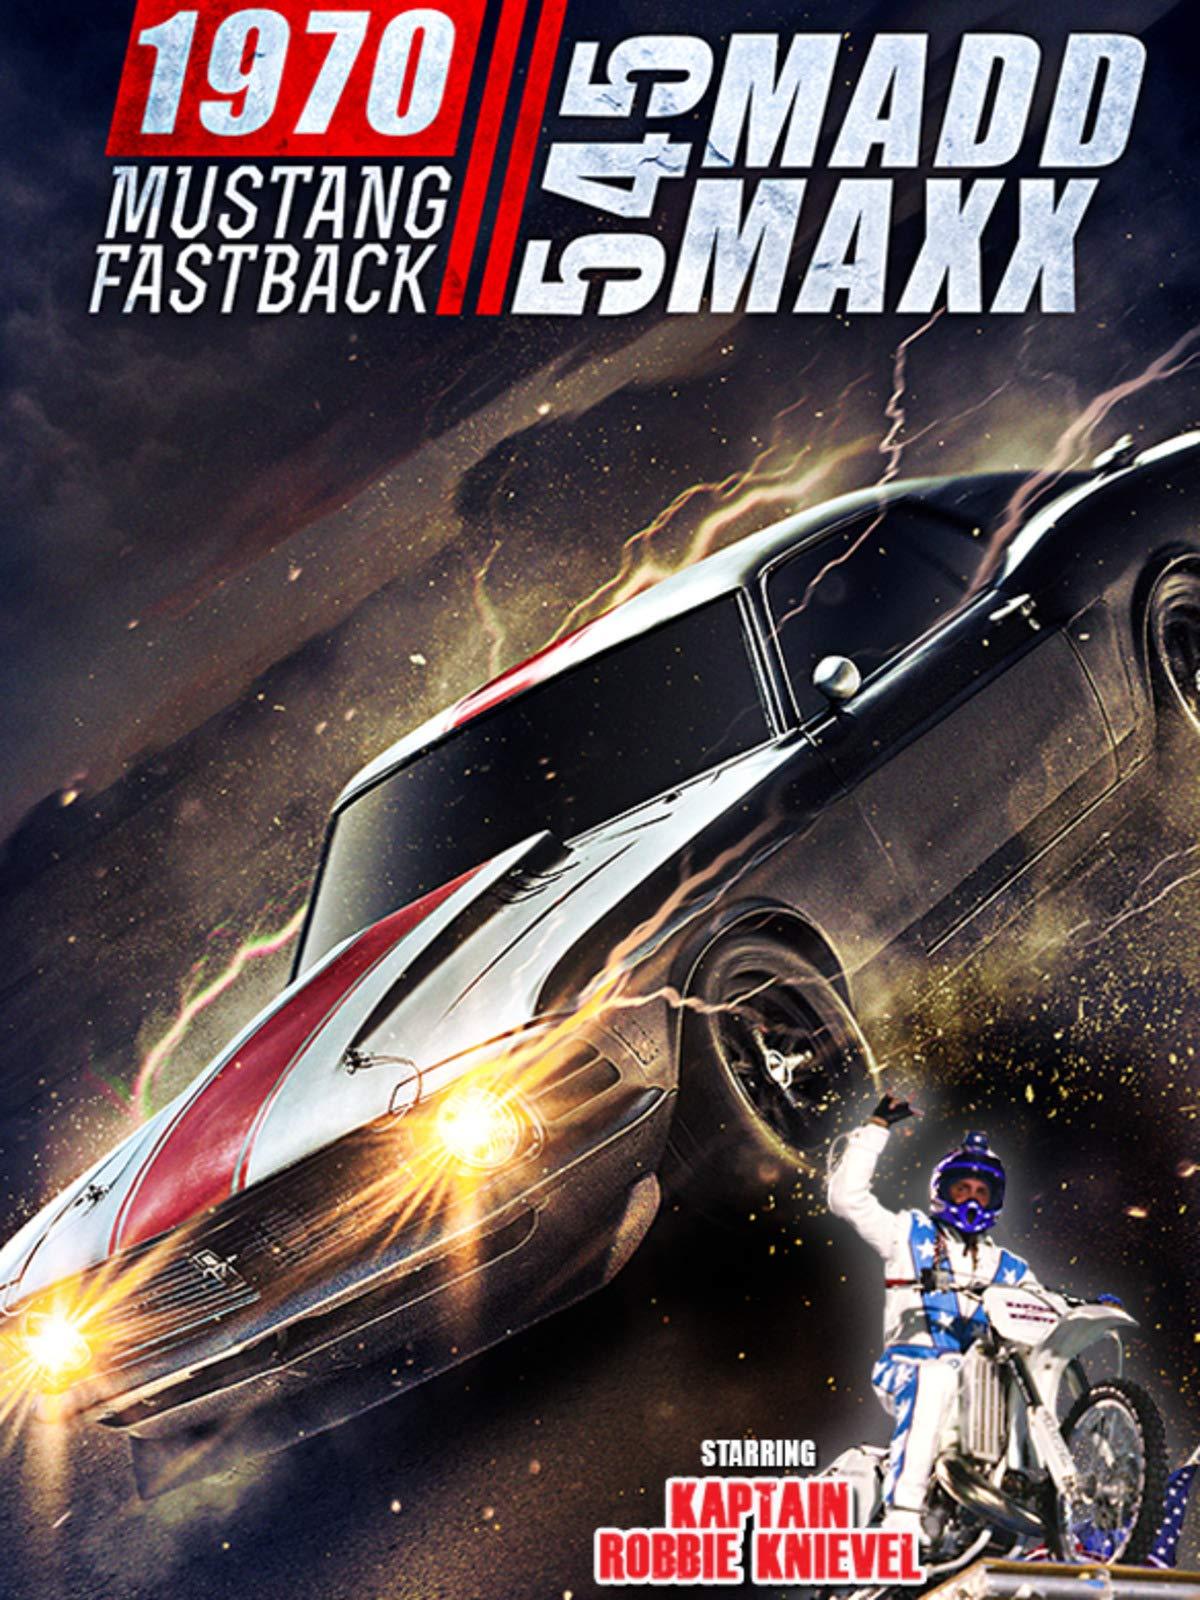 545 Madd Maxx: 1970 Mustang Fastback